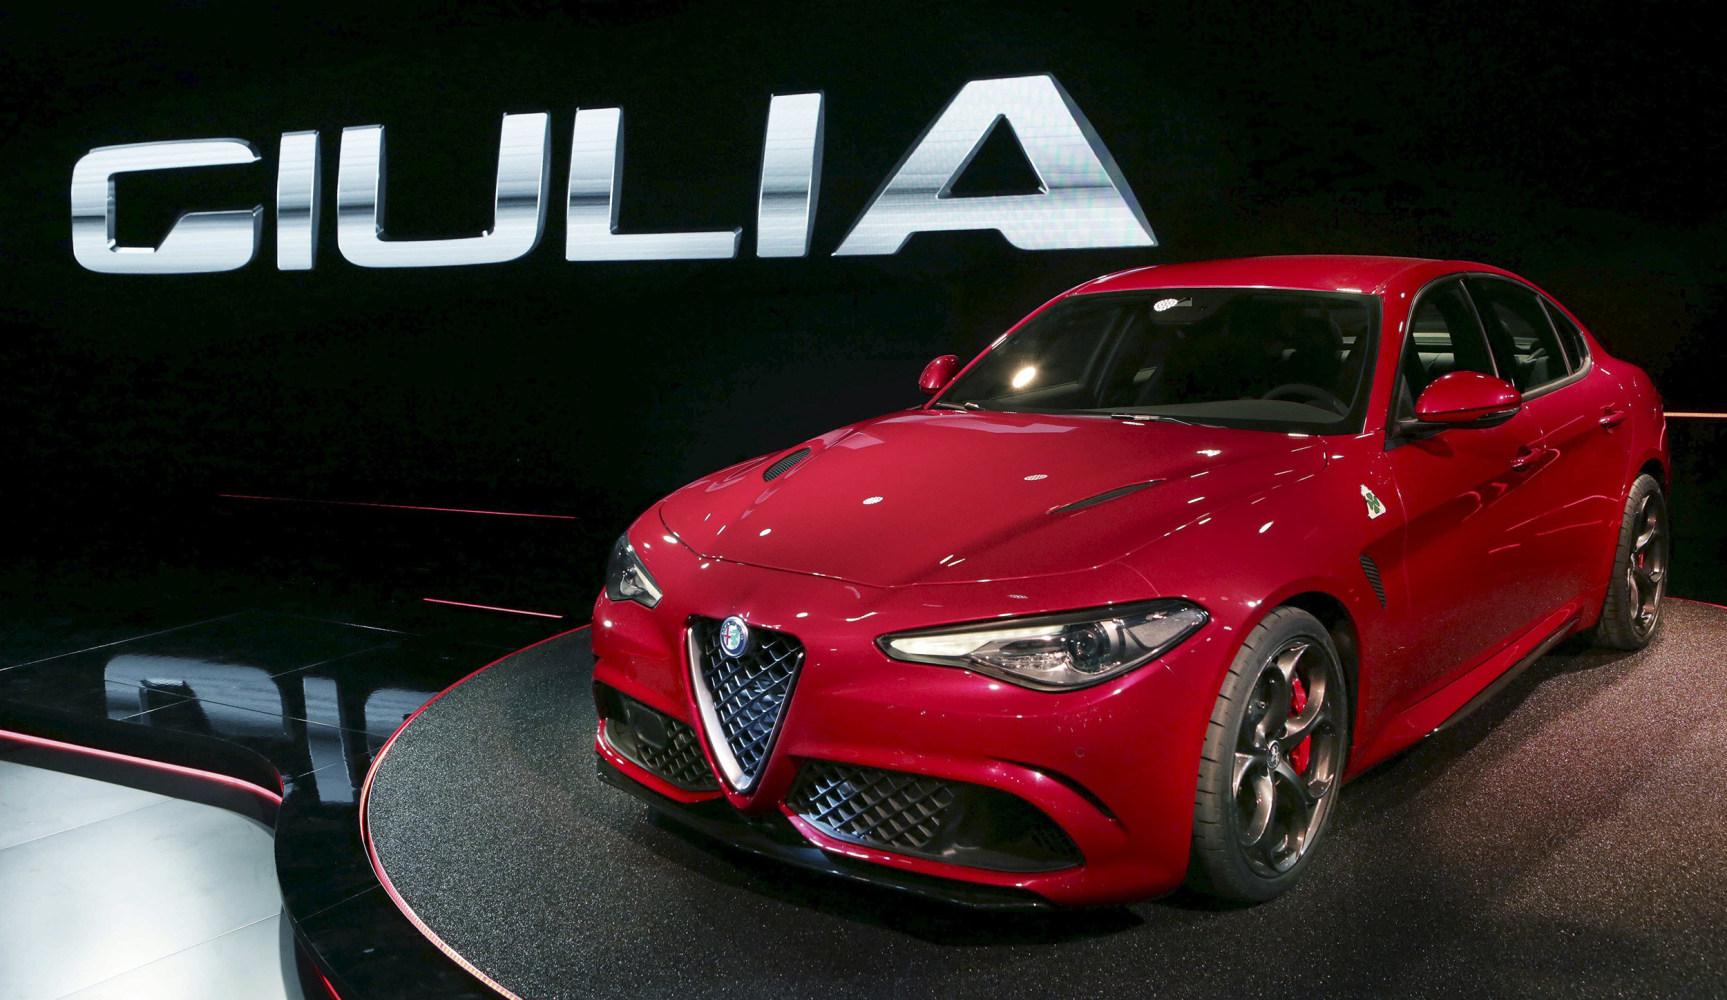 alfa romeo new car releasesAlfa Romeo Launches US Comeback After 20 Years  NBC News